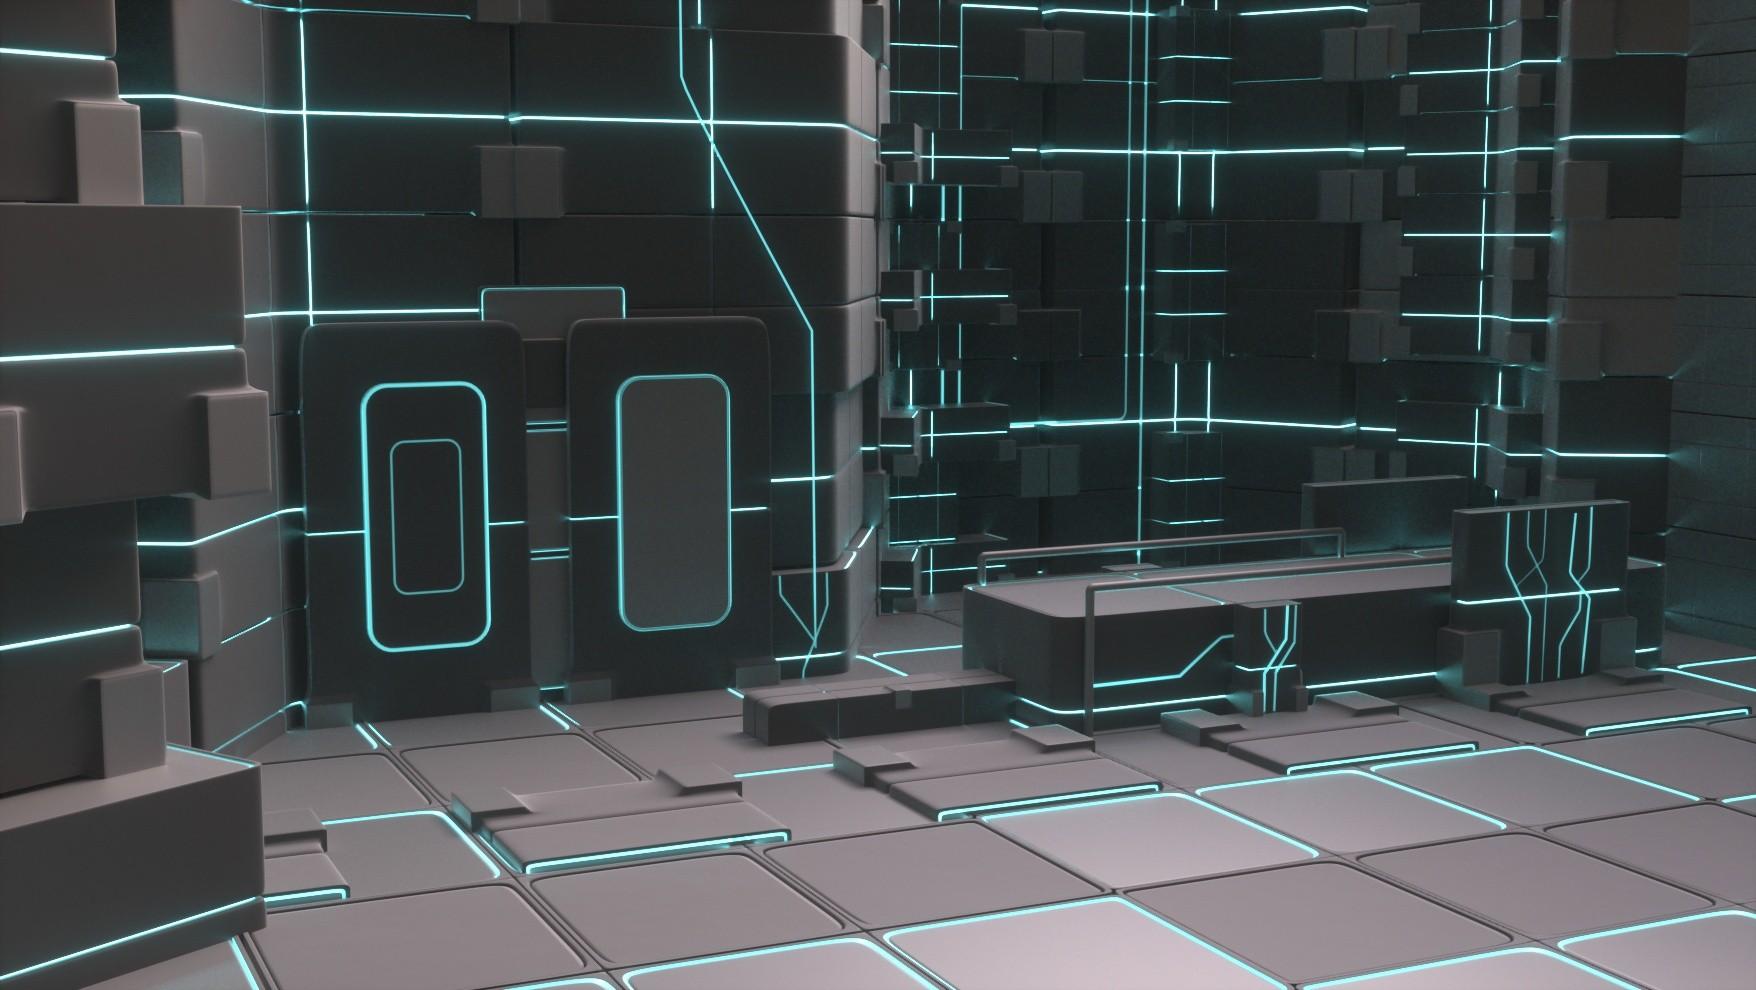 Kresimir jelusic robob3ar 2017 test